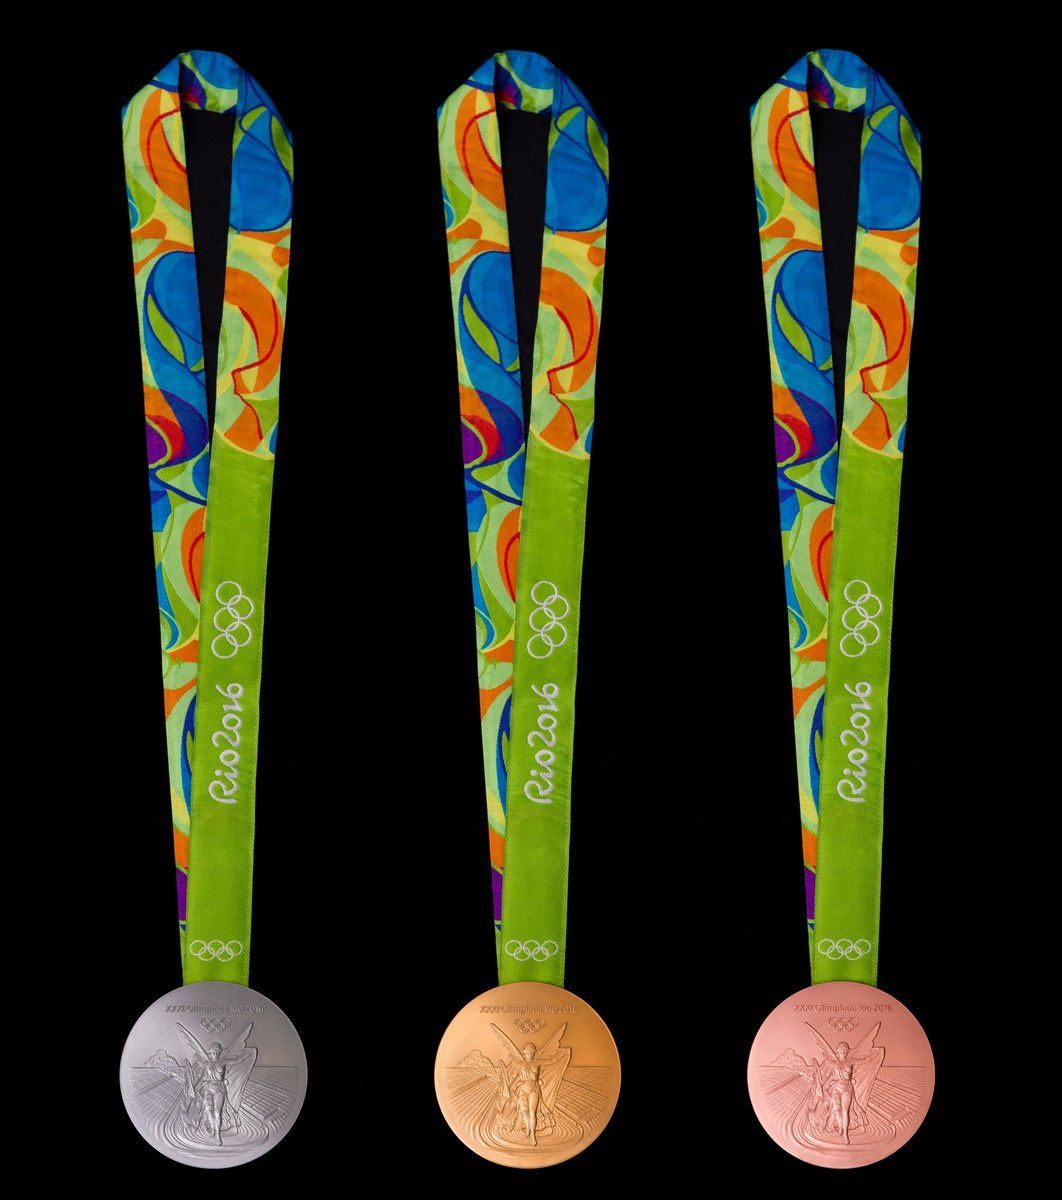 Rio 2016 on Olympic medals, Olympics, Rio olympics 2016